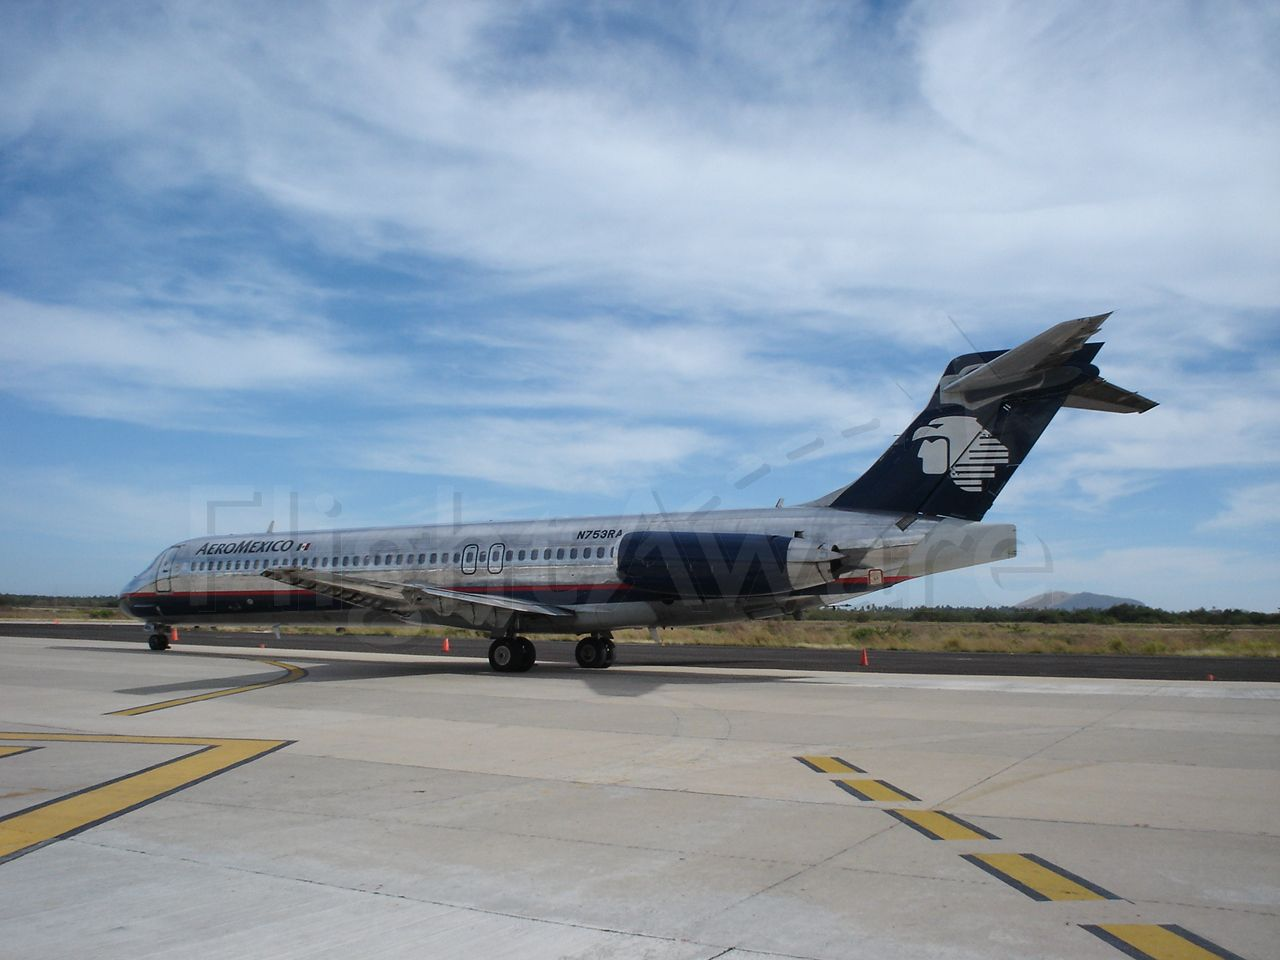 McDonnell Douglas MD-87 (N753RA)